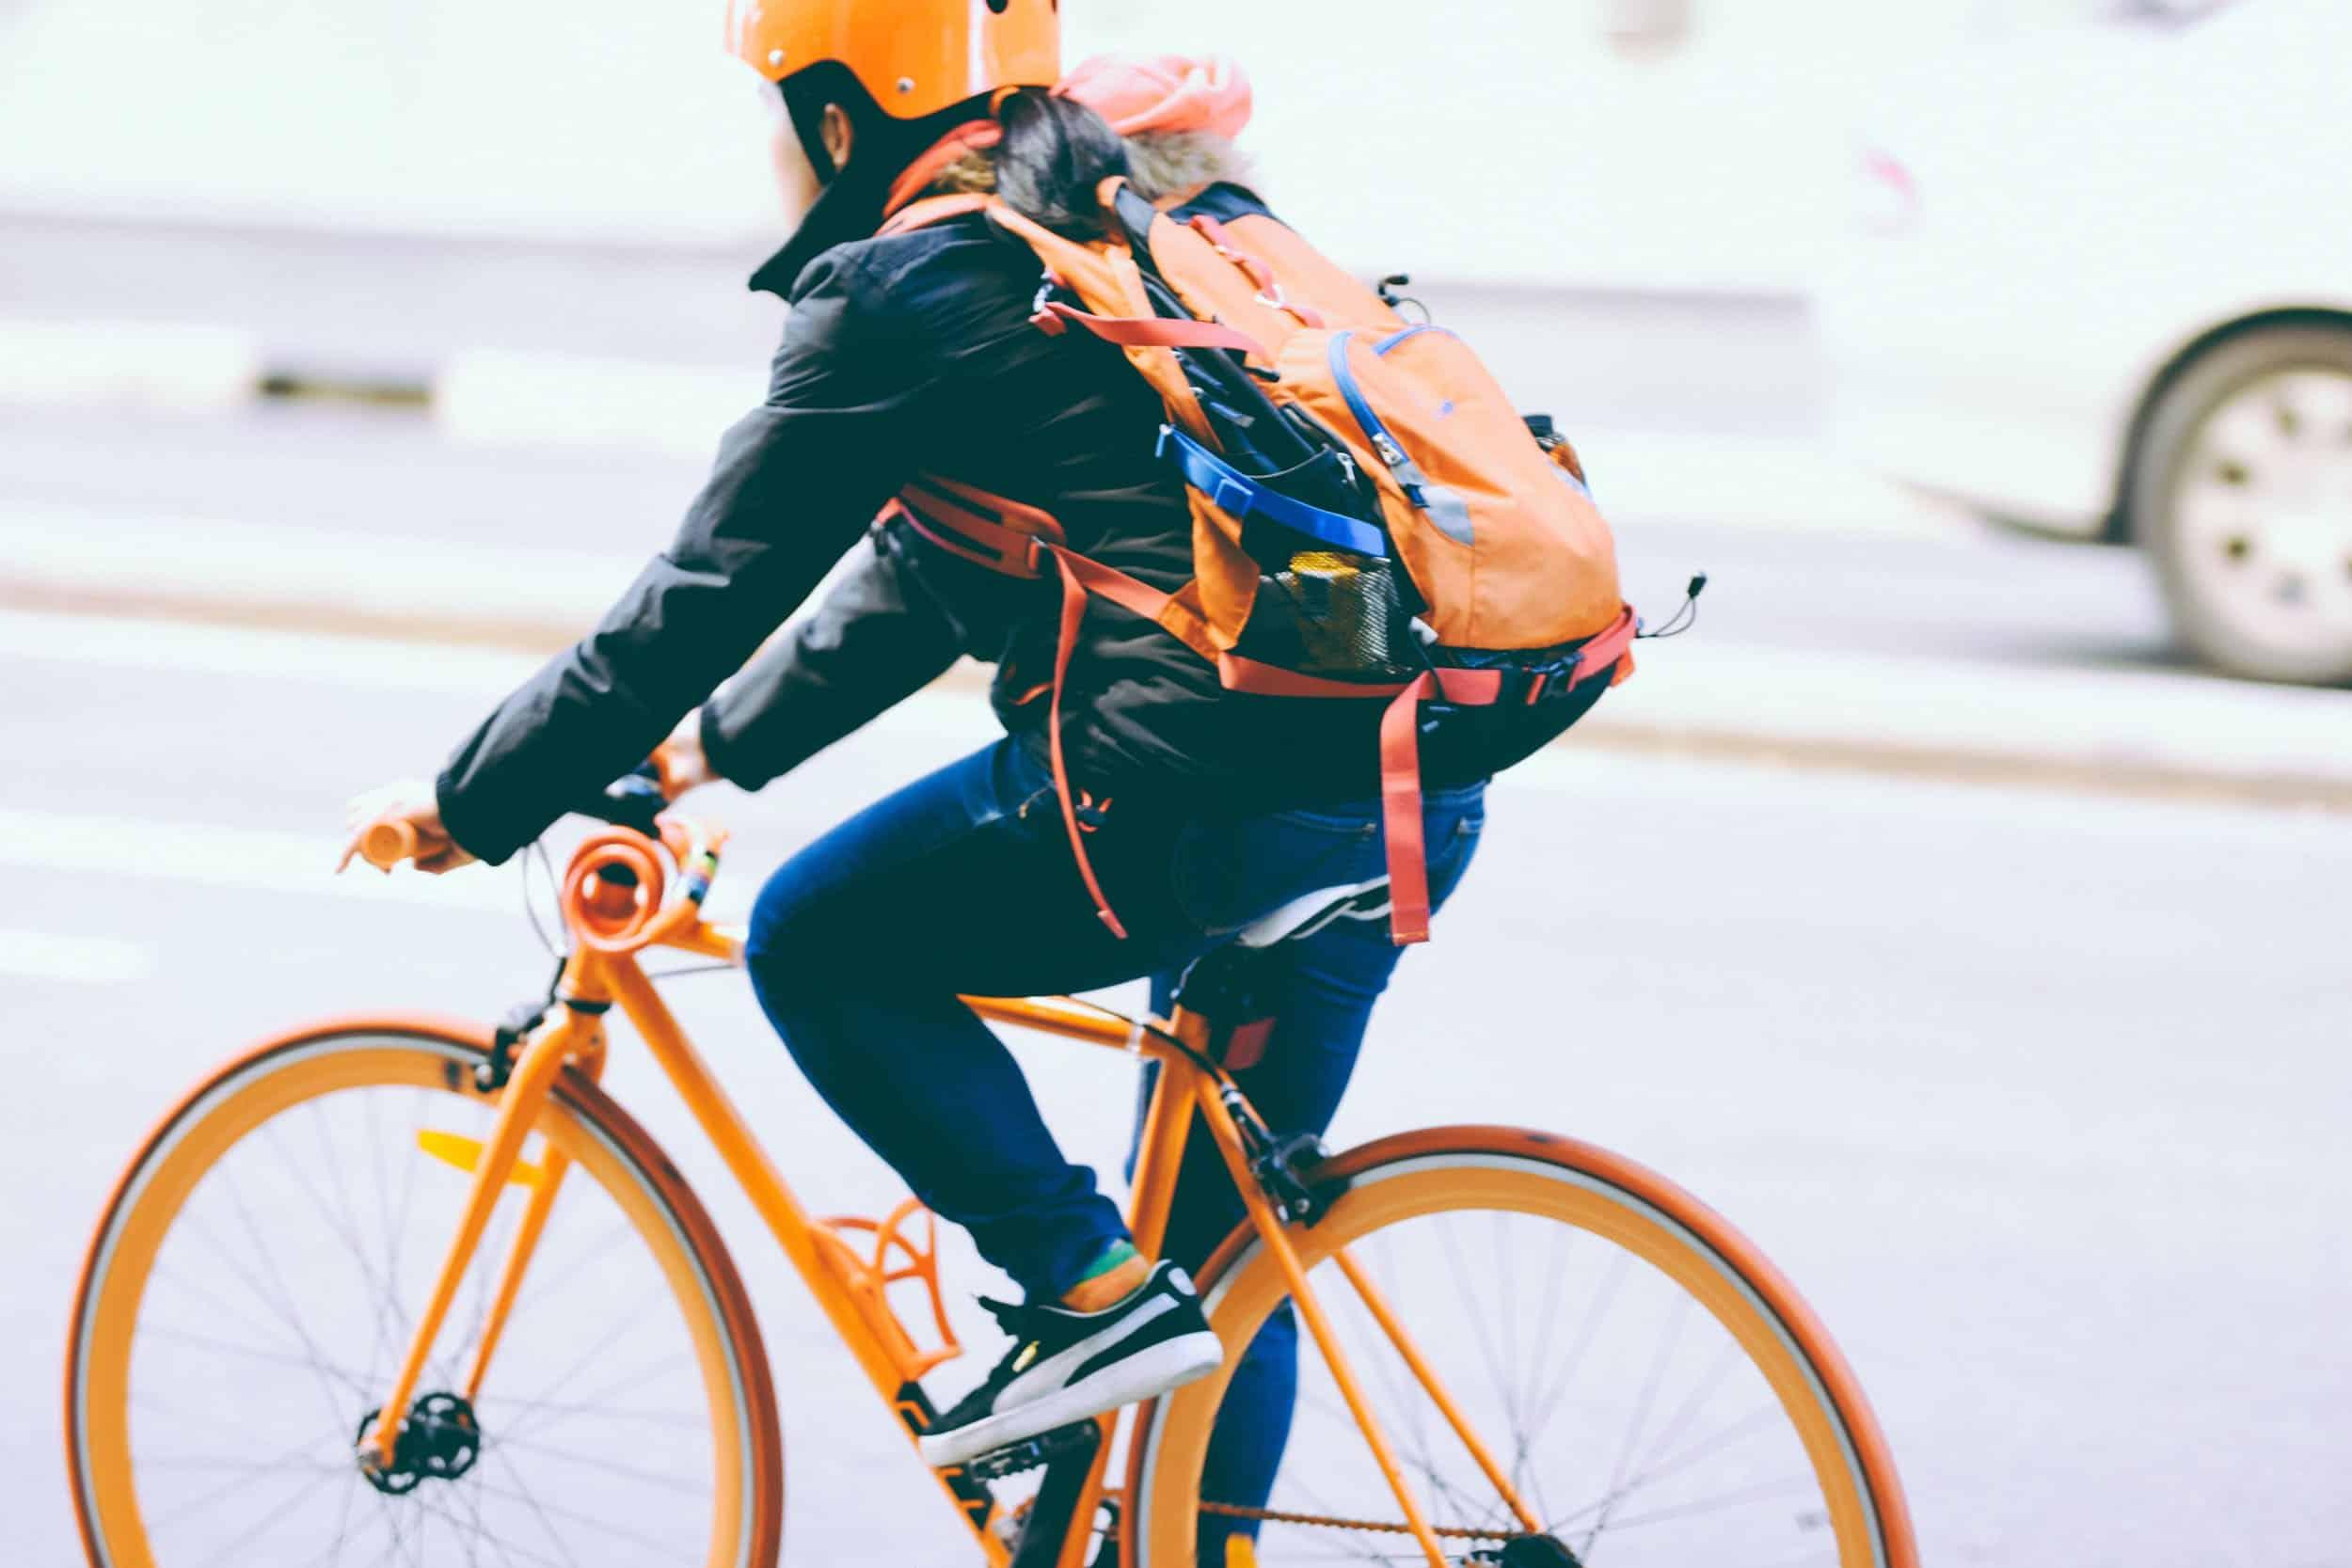 Samdai Courier riding